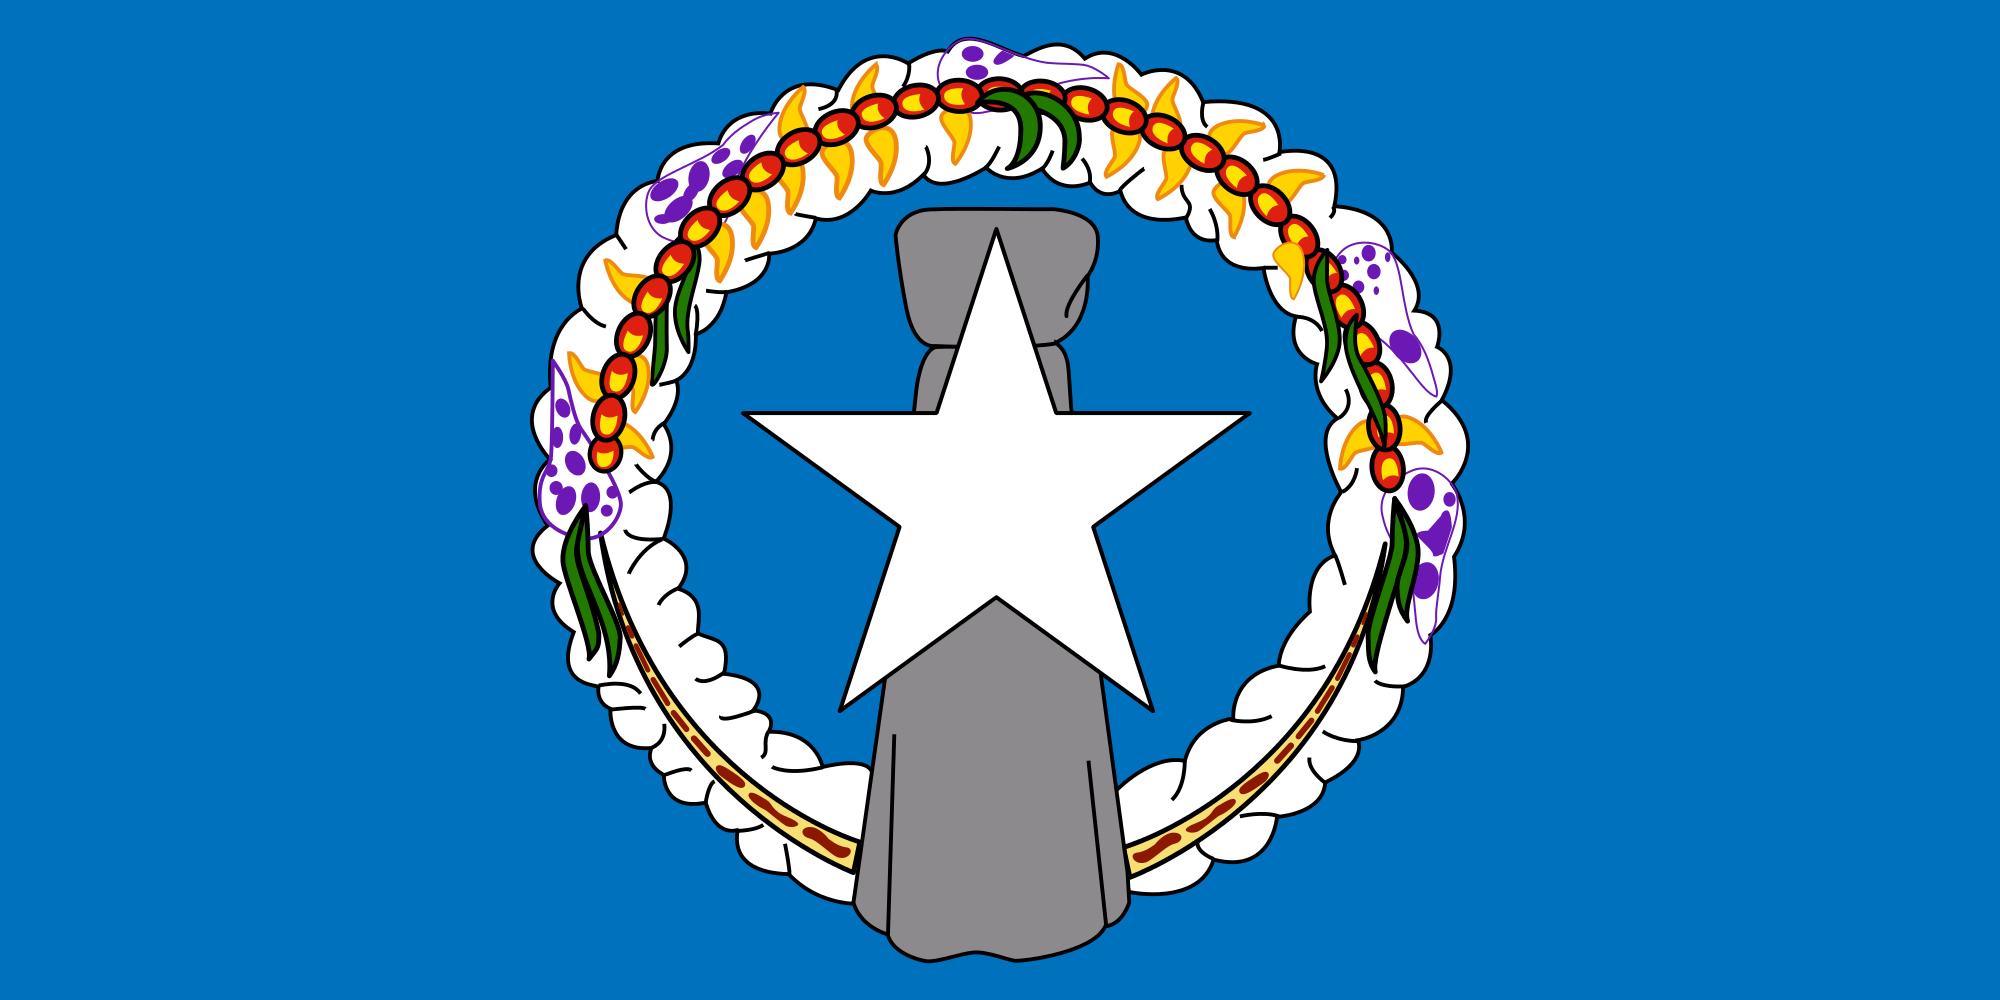 islas marianas del norte, país, emblema, insignia, シンボル - HD の壁紙 - 教授-falken.com